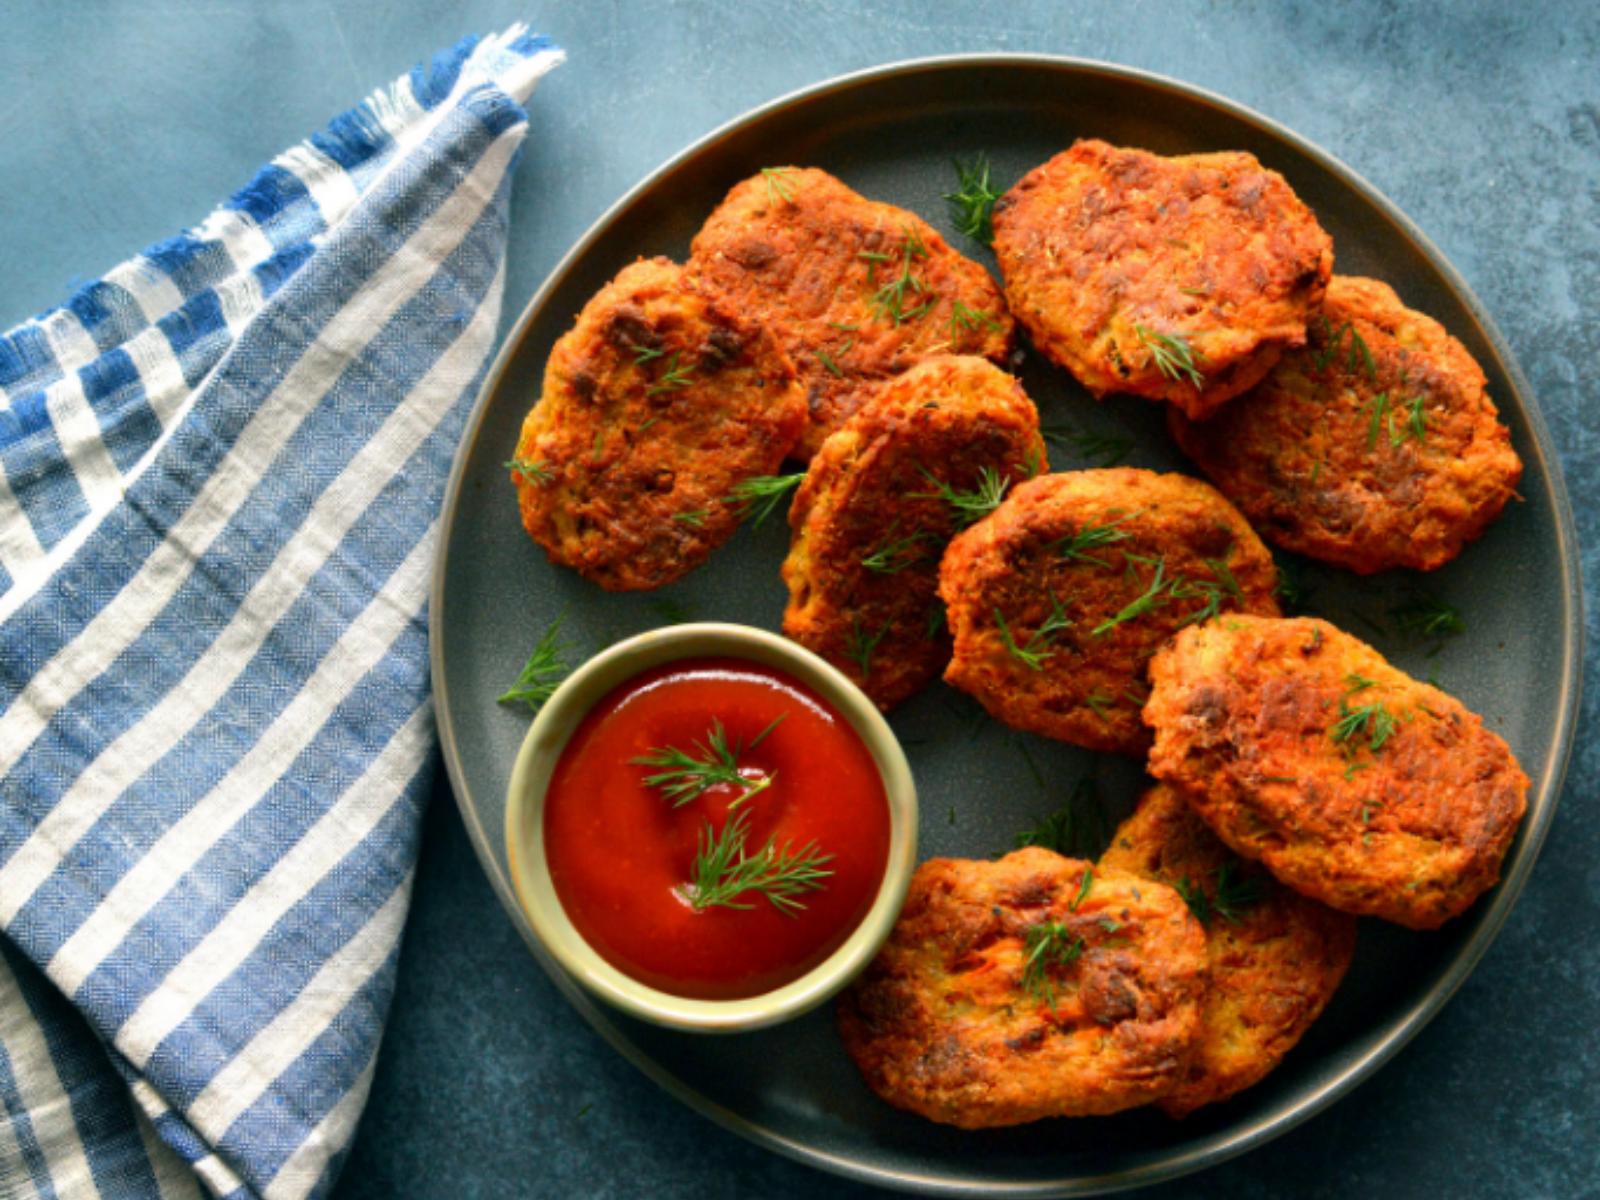 Crispy high-protein red lentil nuggets